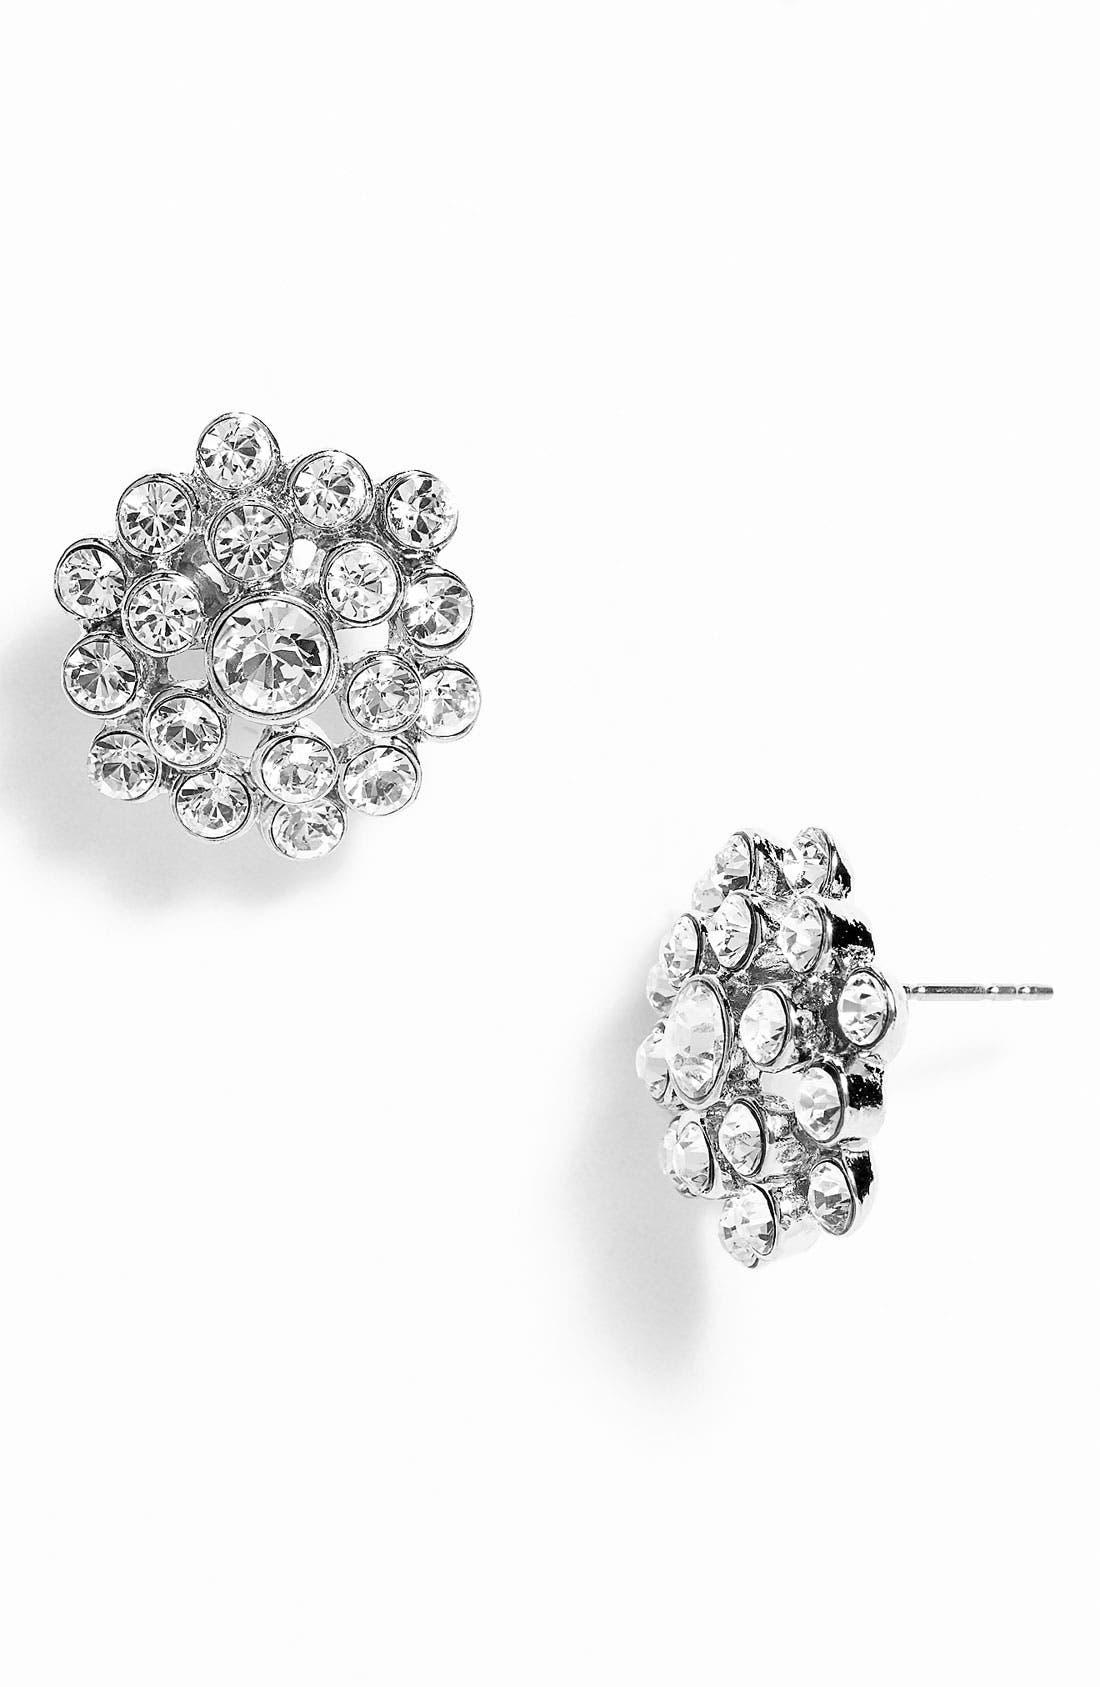 Alternate Image 1 Selected - Nina 'Marseill' Round Cluster Stud Earrings